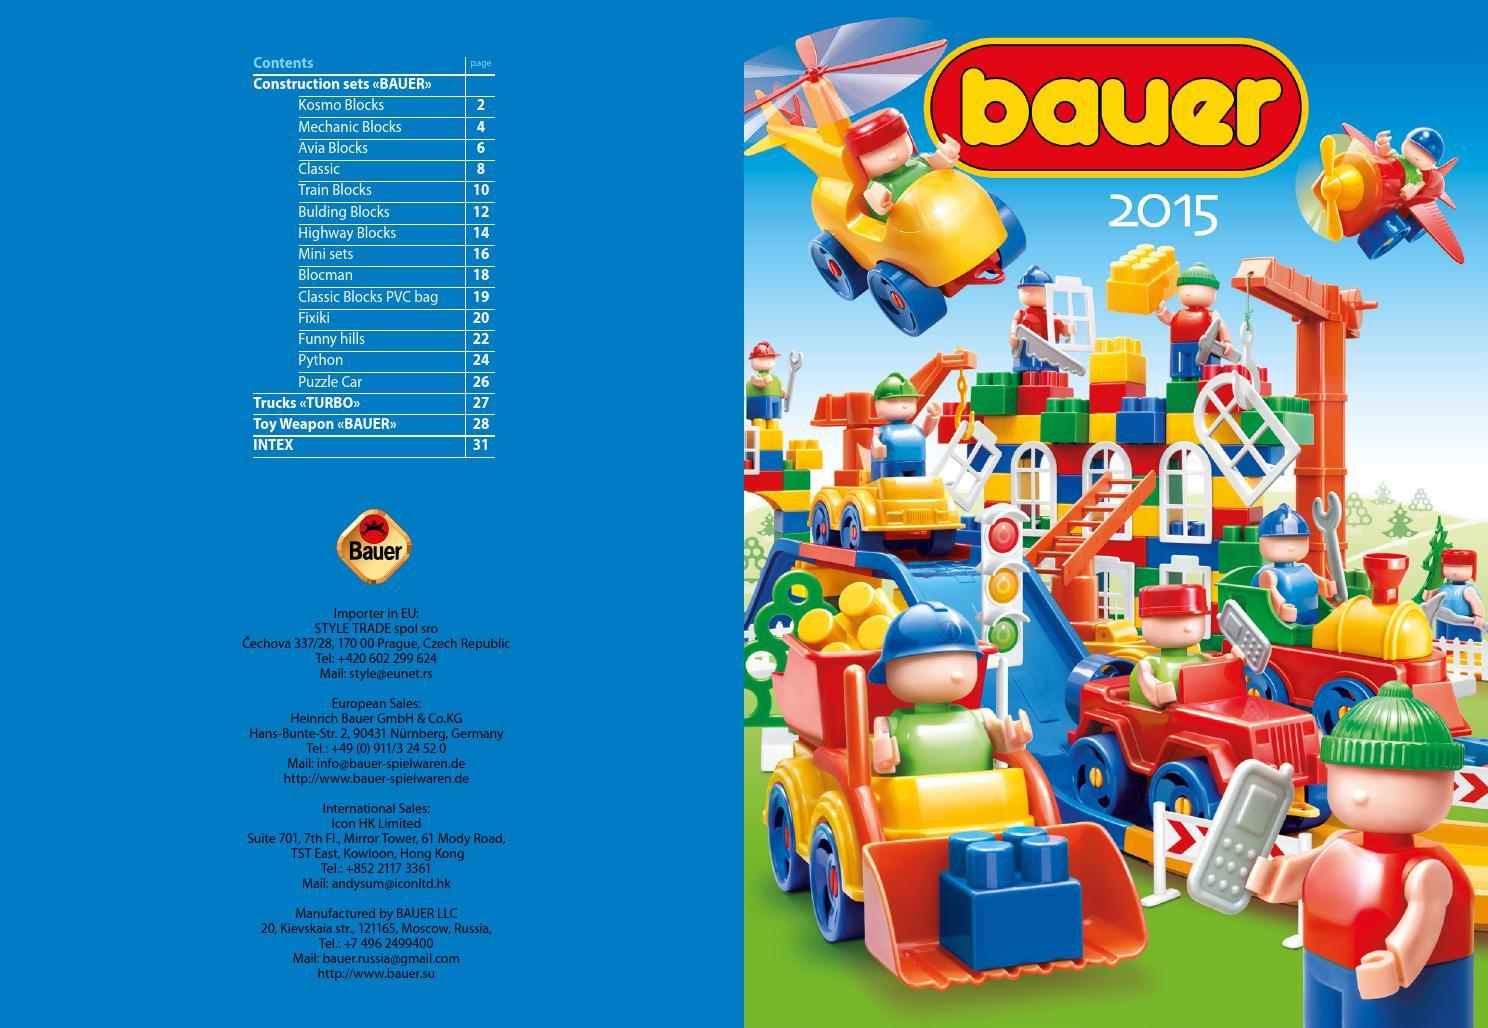 Bauer katalog 04 10 2015 копия by Bauer Toys - issuu